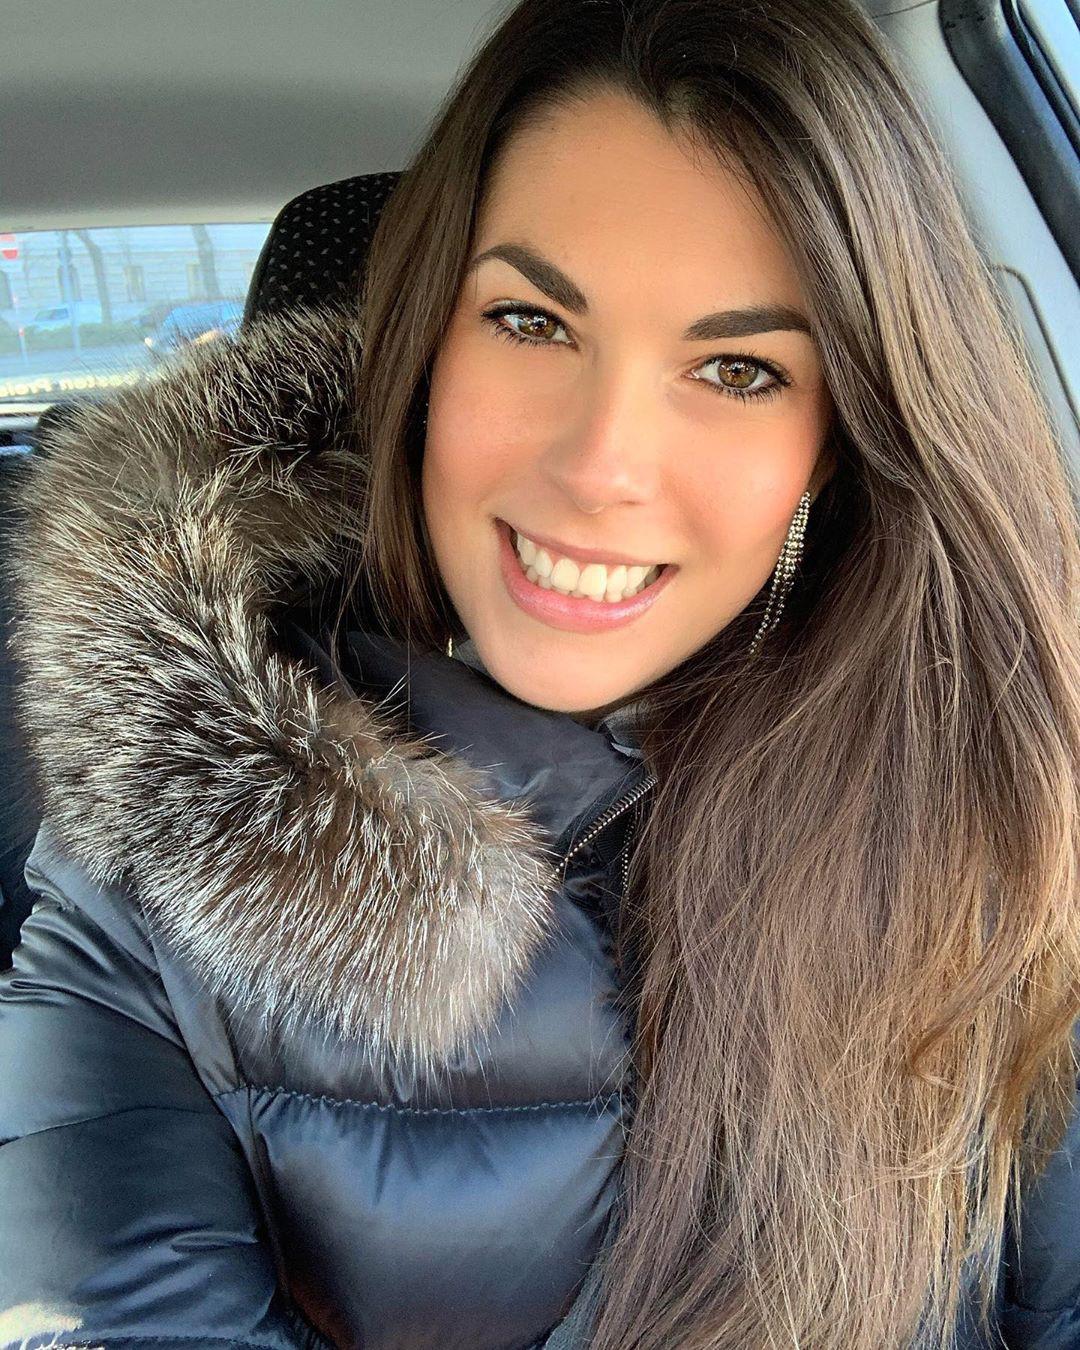 Stefanie Capshield fur clothing, fur dresses ideas, Pretty Look